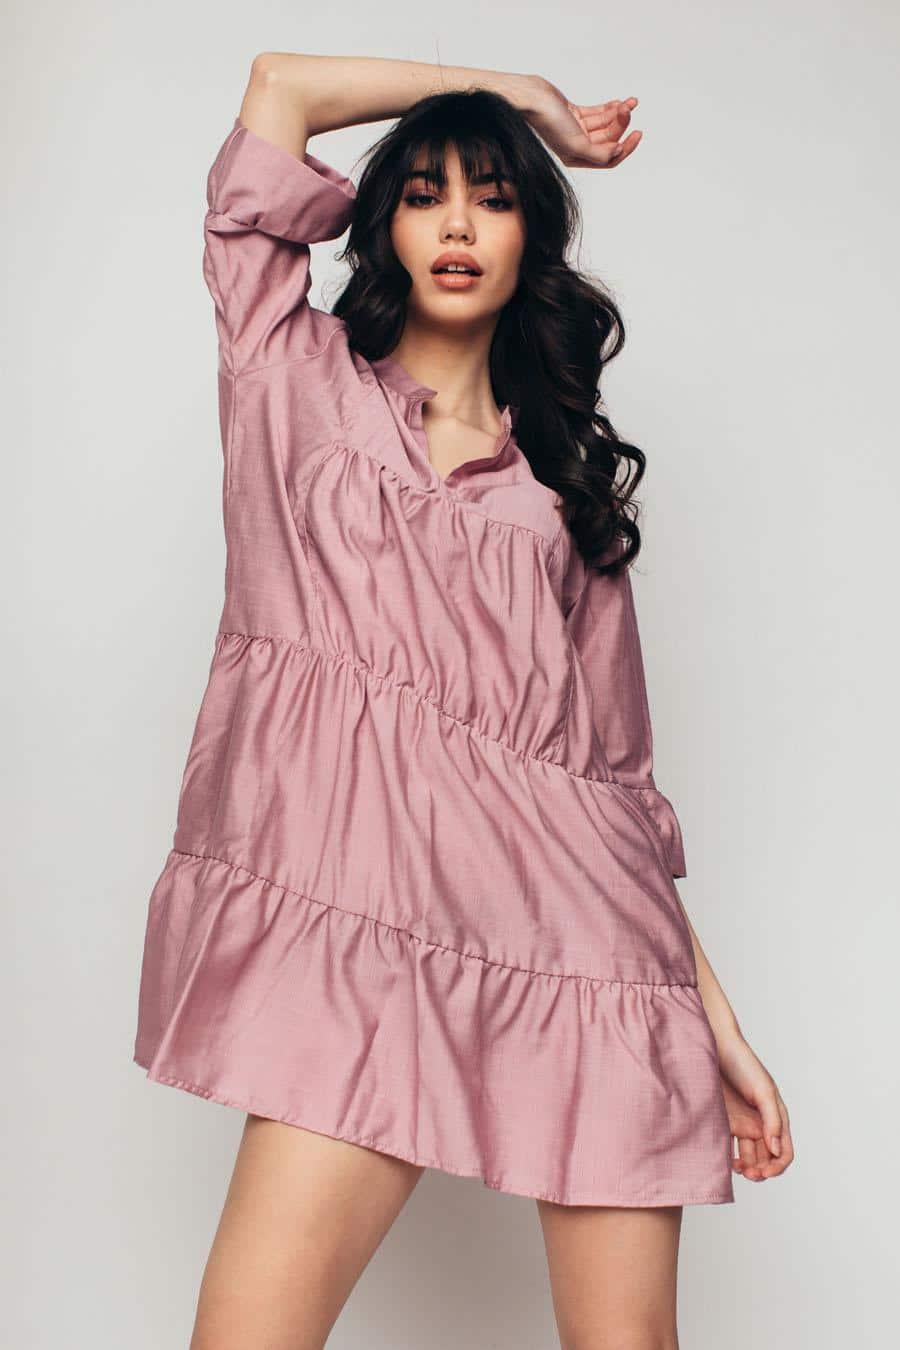 jagger zenska haljina kolekcija prolece leto 2021 ss 2021 kupi online jg 5505 10 02